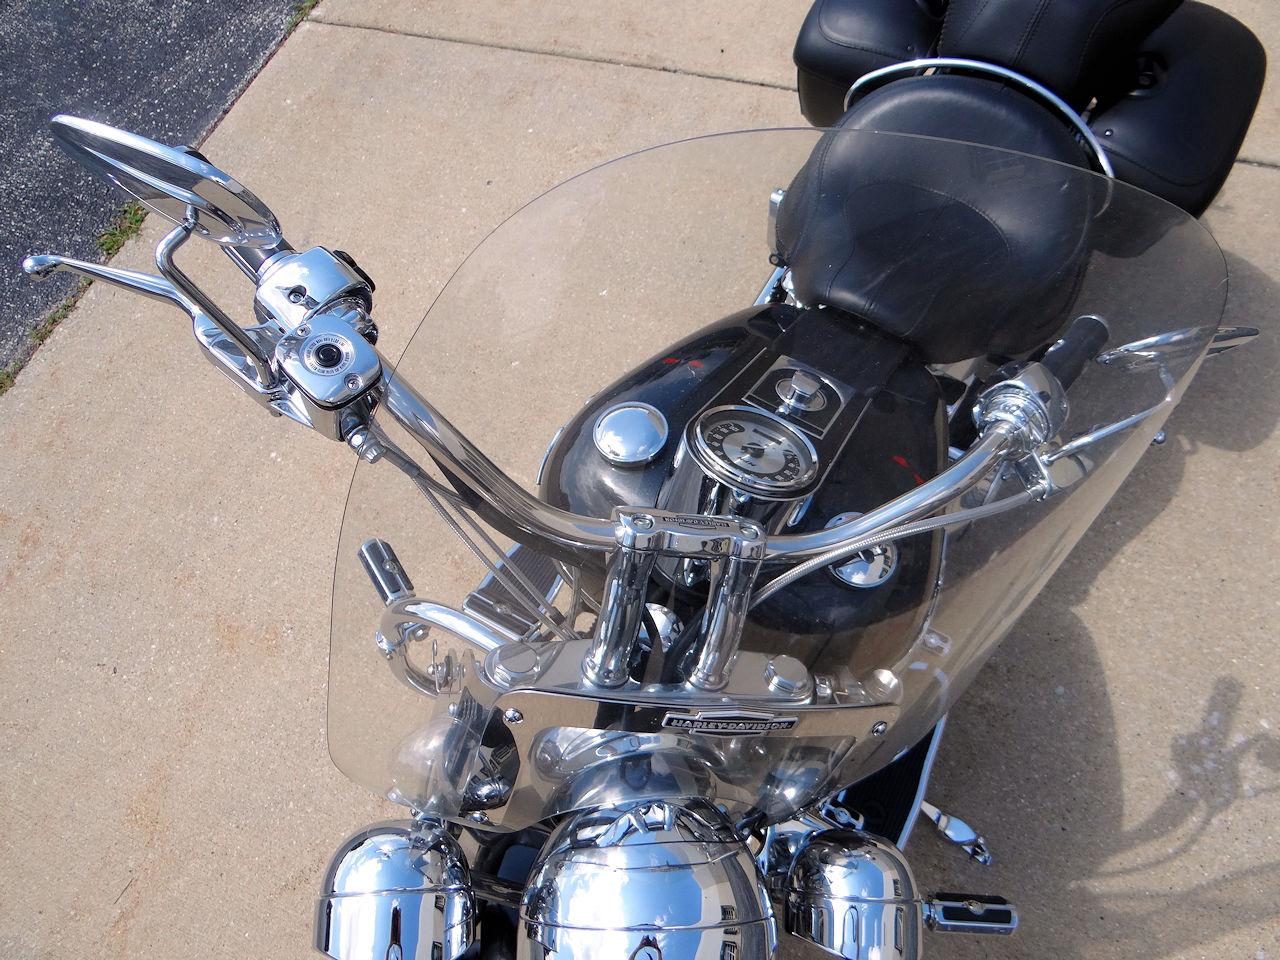 2006 Harley Davidson FLSTNI 53